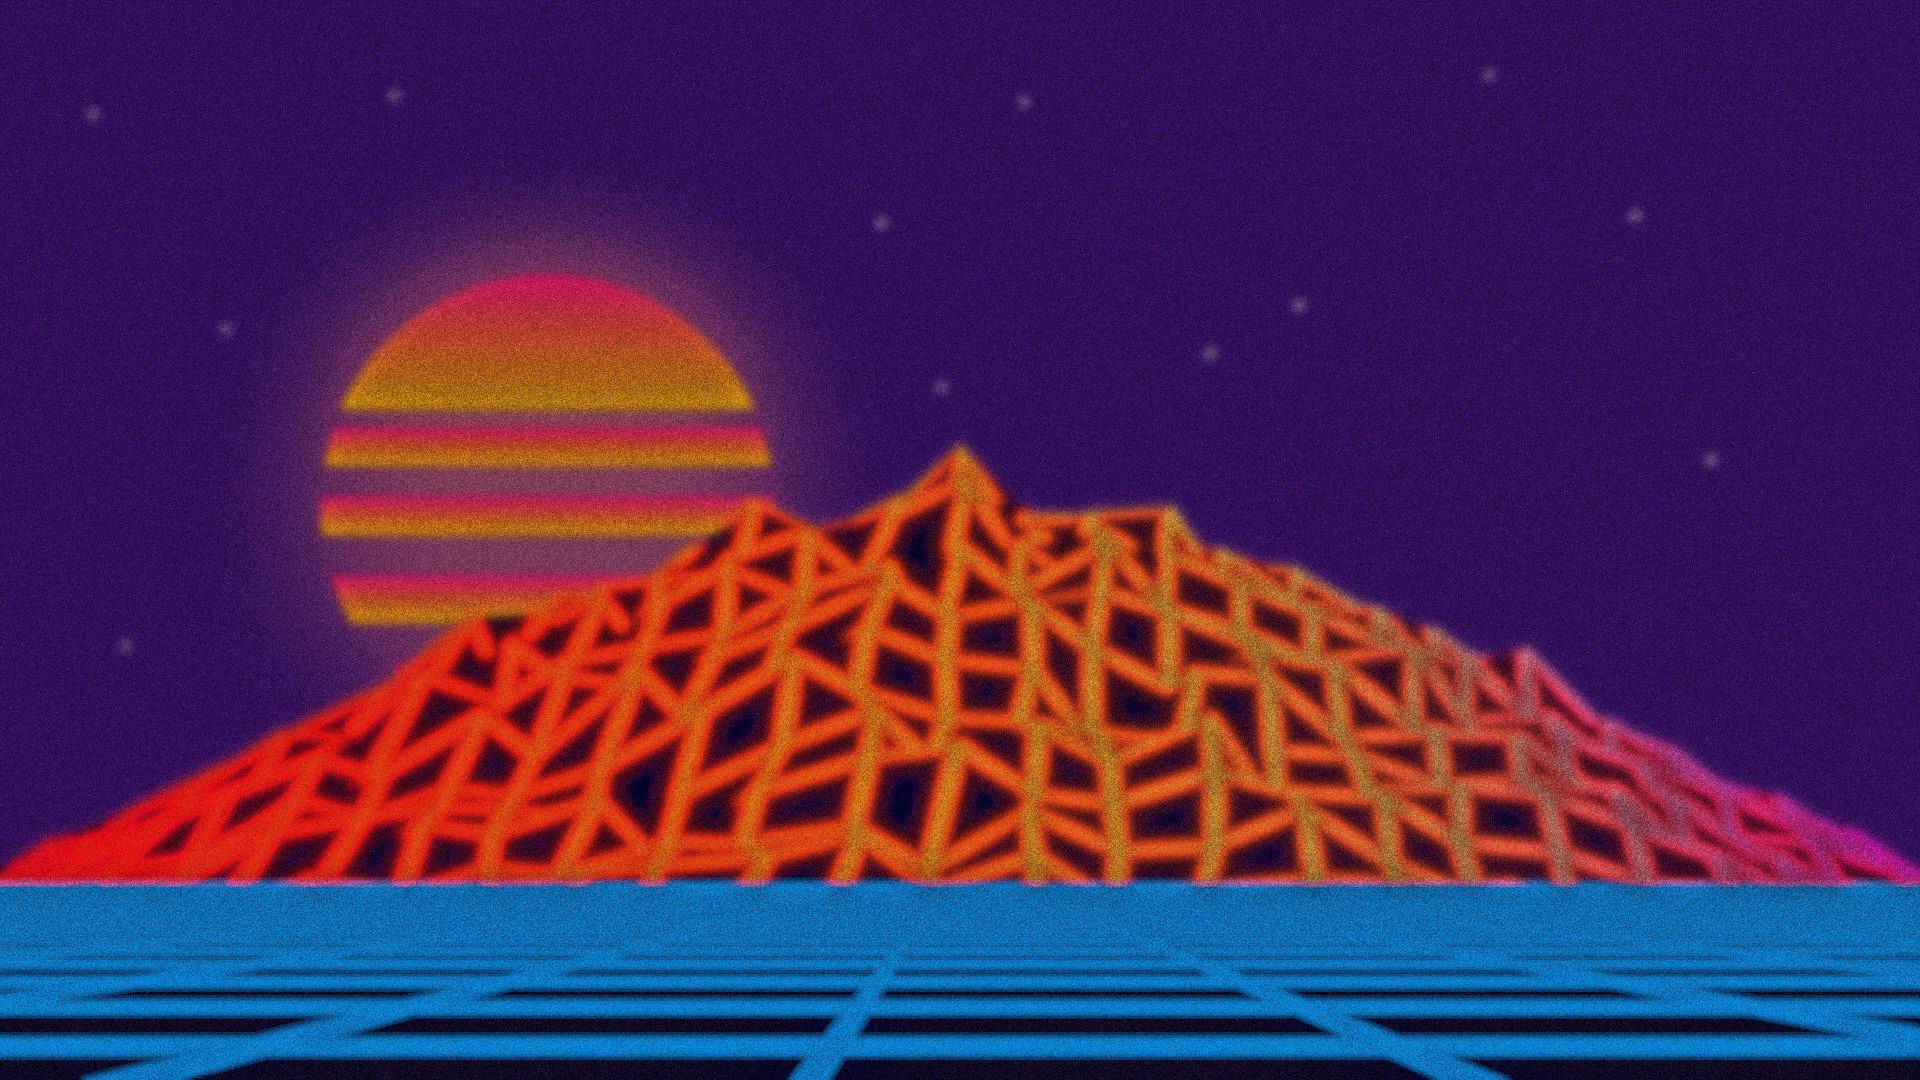 Retro wallpapers HD for desktop backgrounds